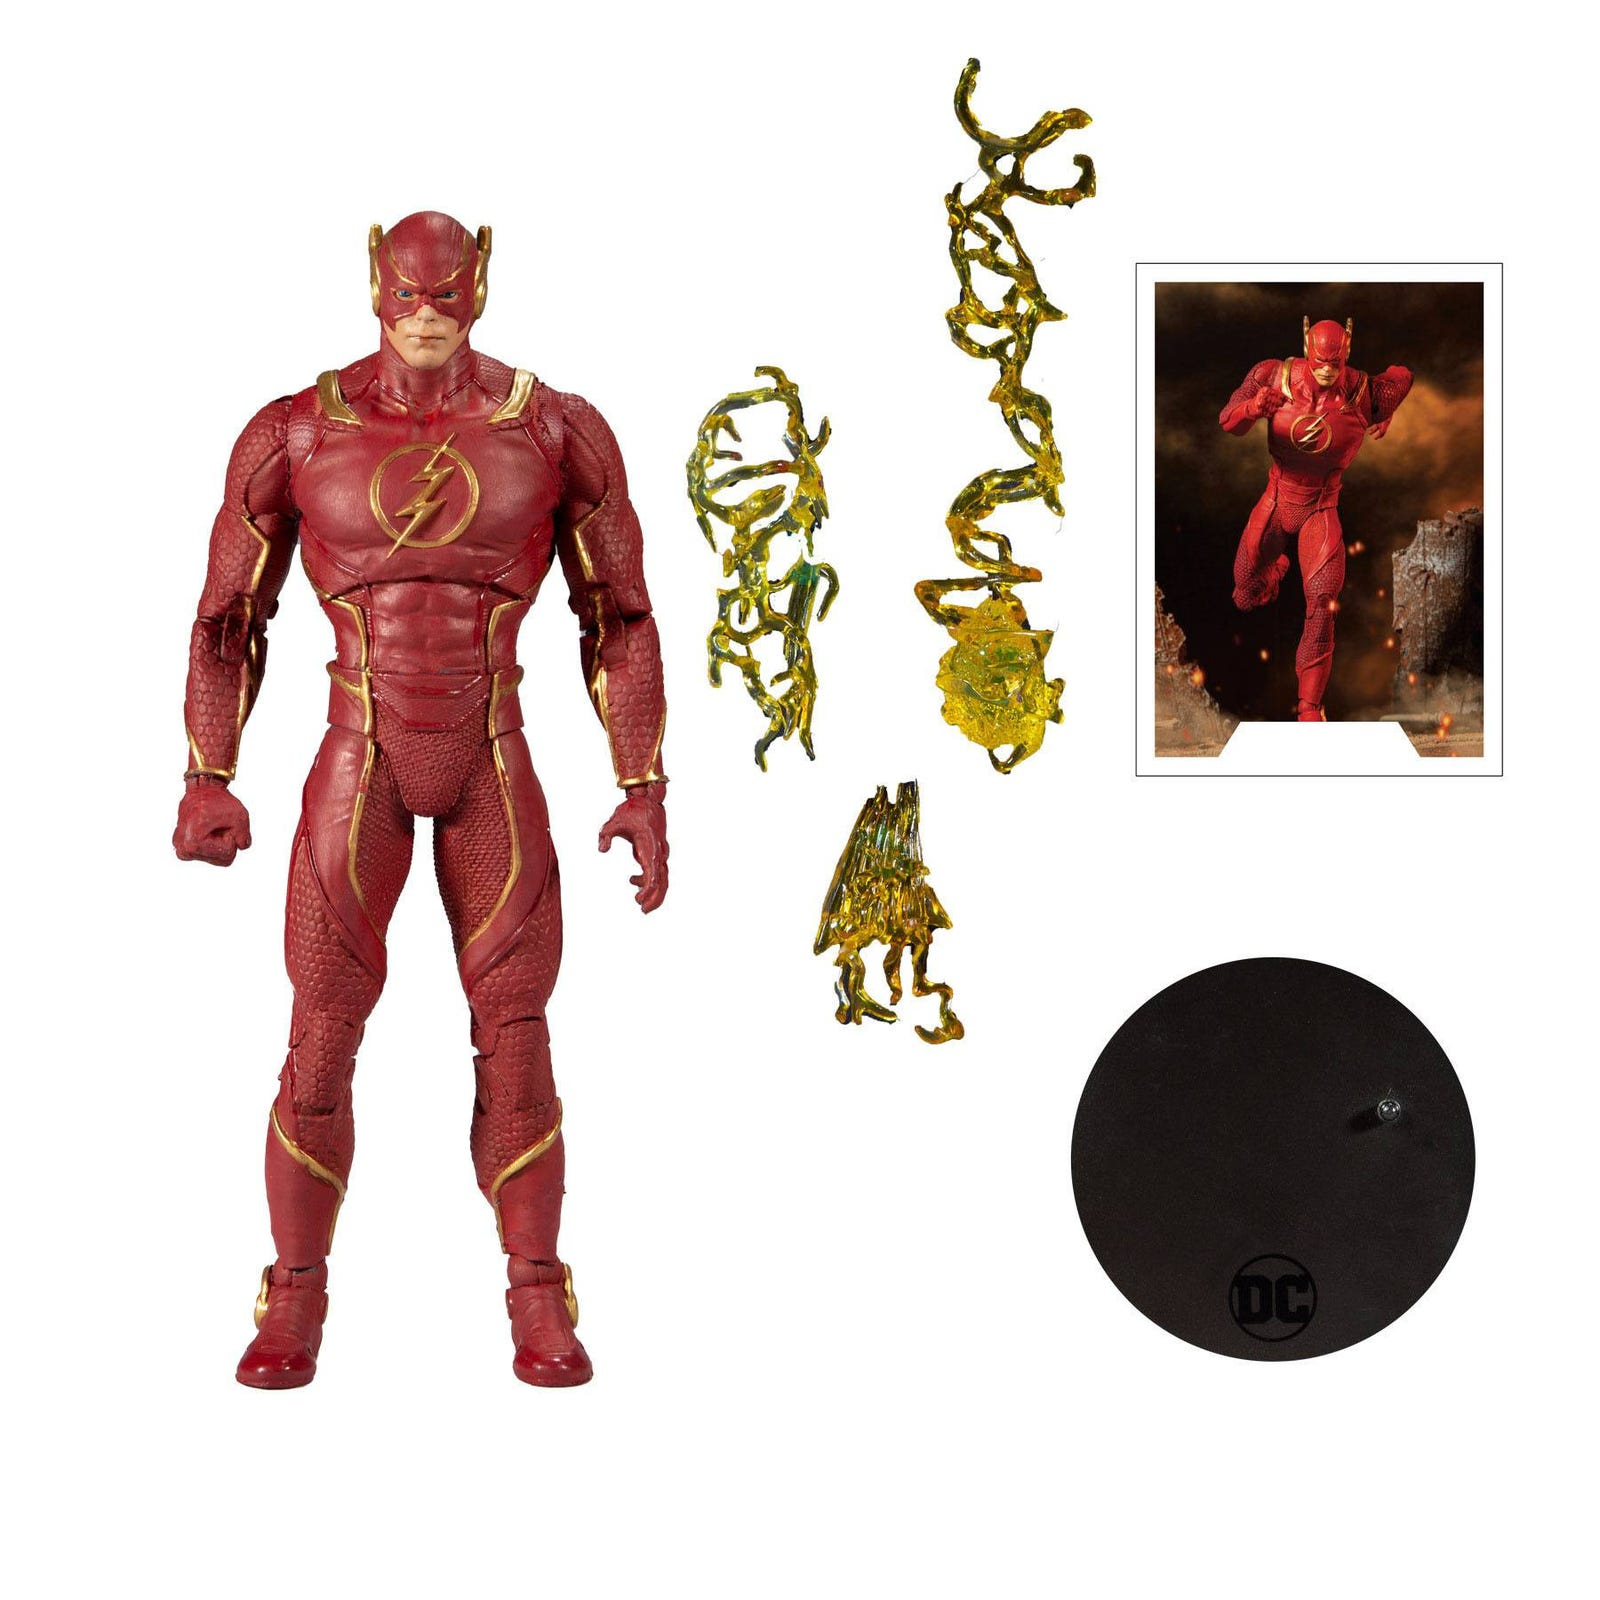 DC Multiverse Actionfigur The Flash: Injustice 2 18 cm MCF15356-9 787926153569